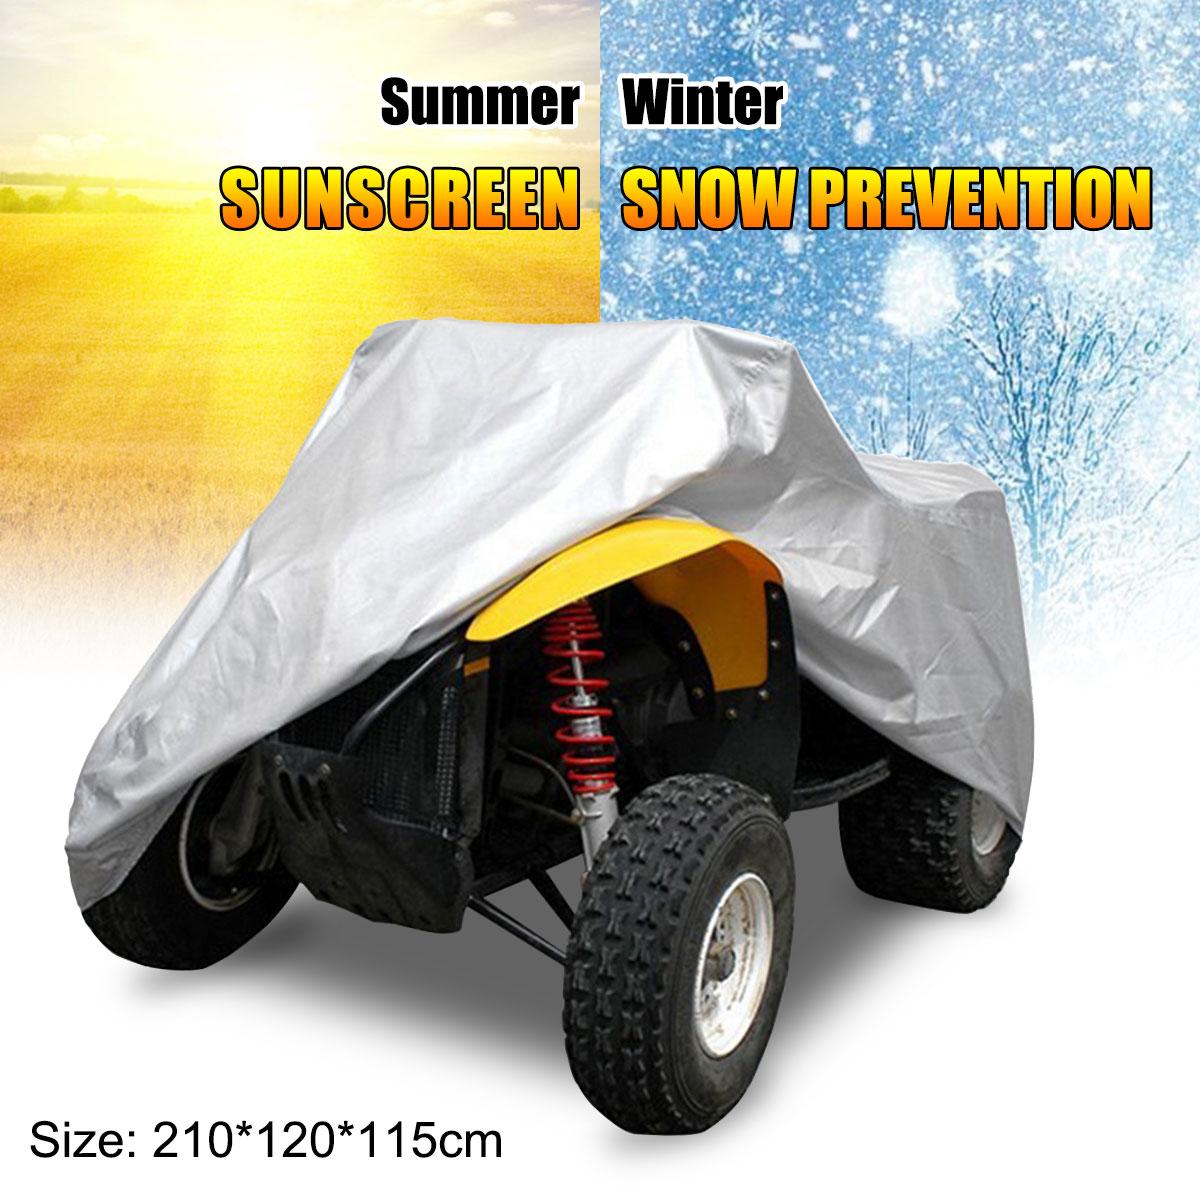 190T Waterproof UV Heatproof Quad Bike Tractor ATV Cover Anti UV Rain Lawn Mower ATV Car Cover + Bag XL Large 210x120x115cm